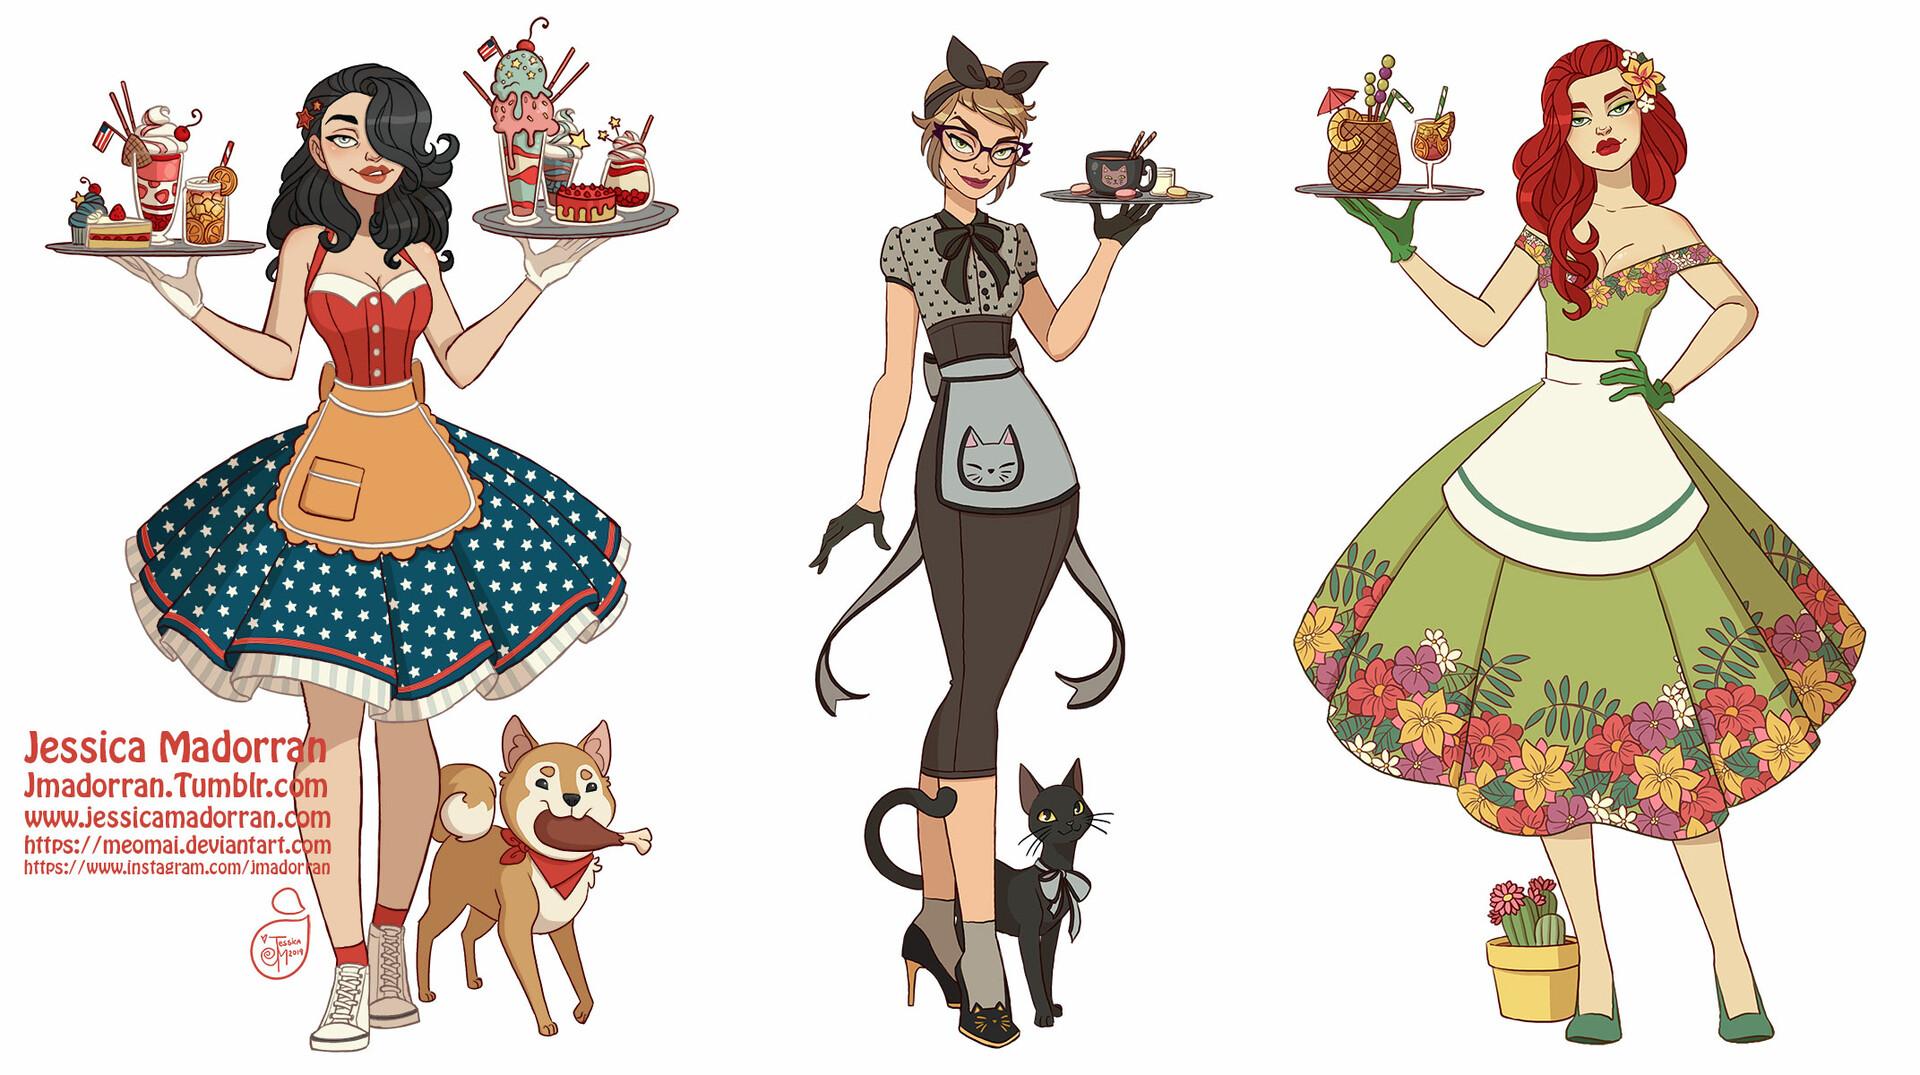 Jessica madorran character design dc 50s style 2019 artstation 01